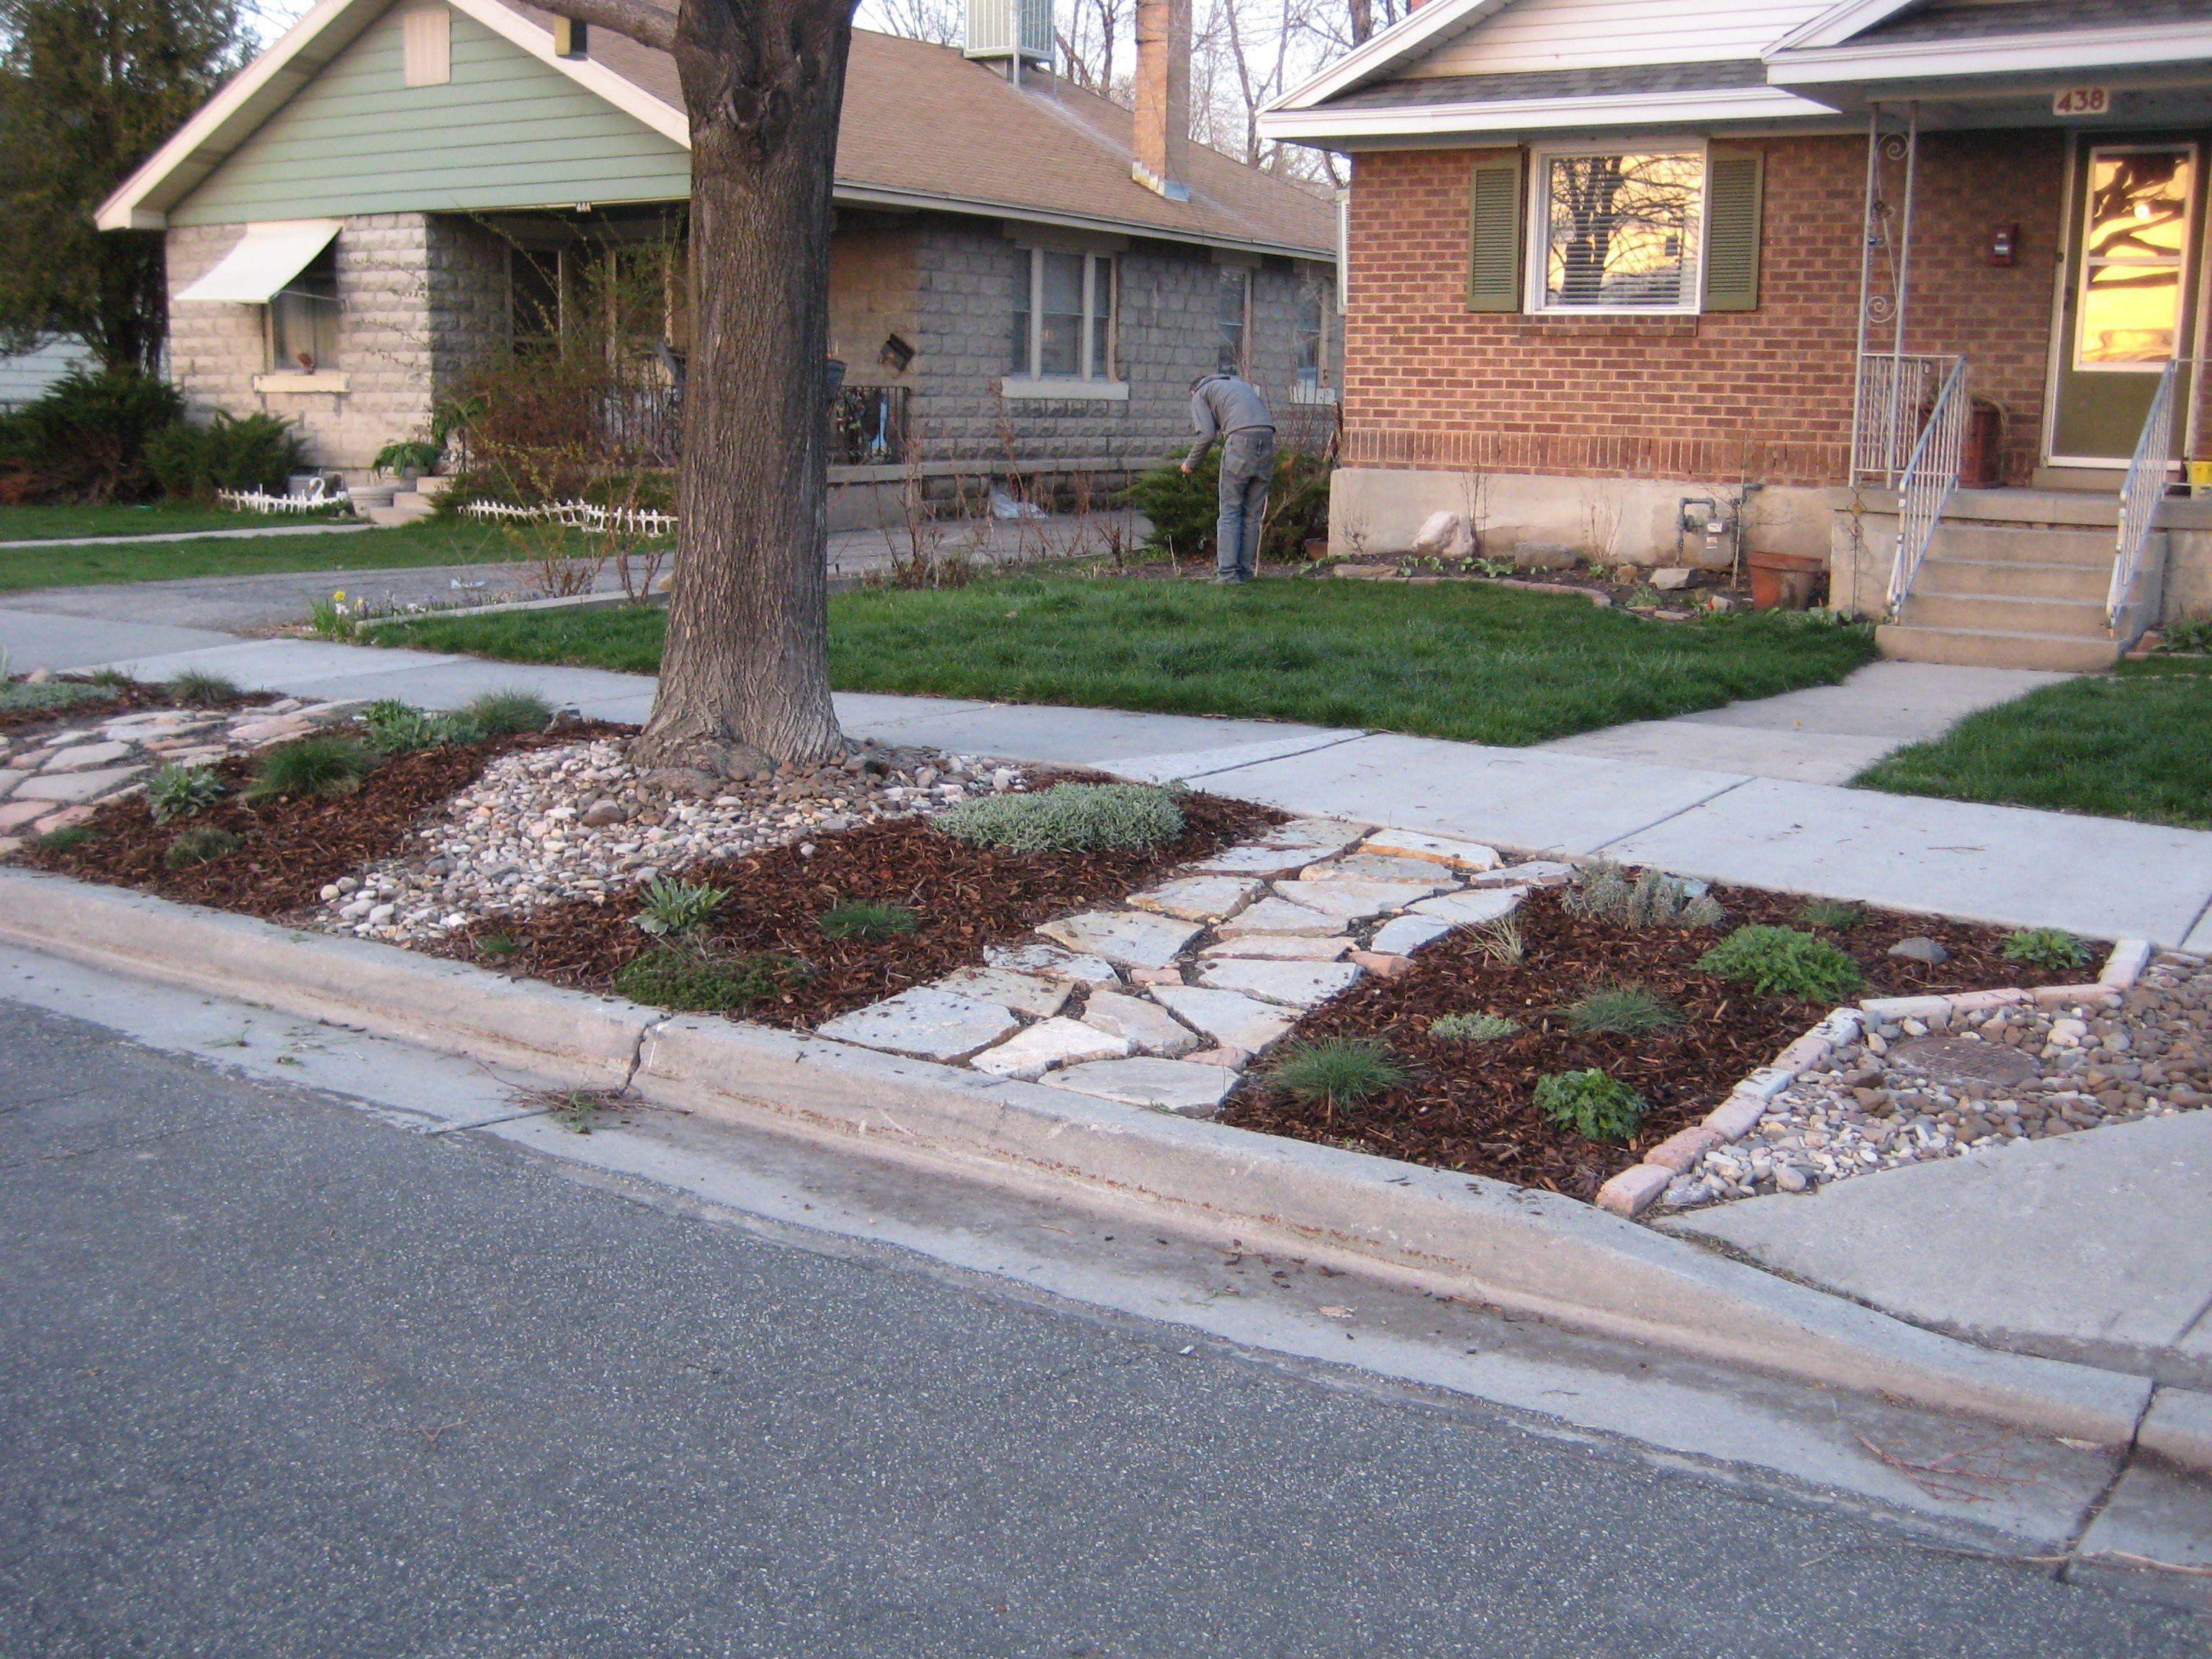 Revisiting The Parking Strip Sidewalk Landscaping Yard